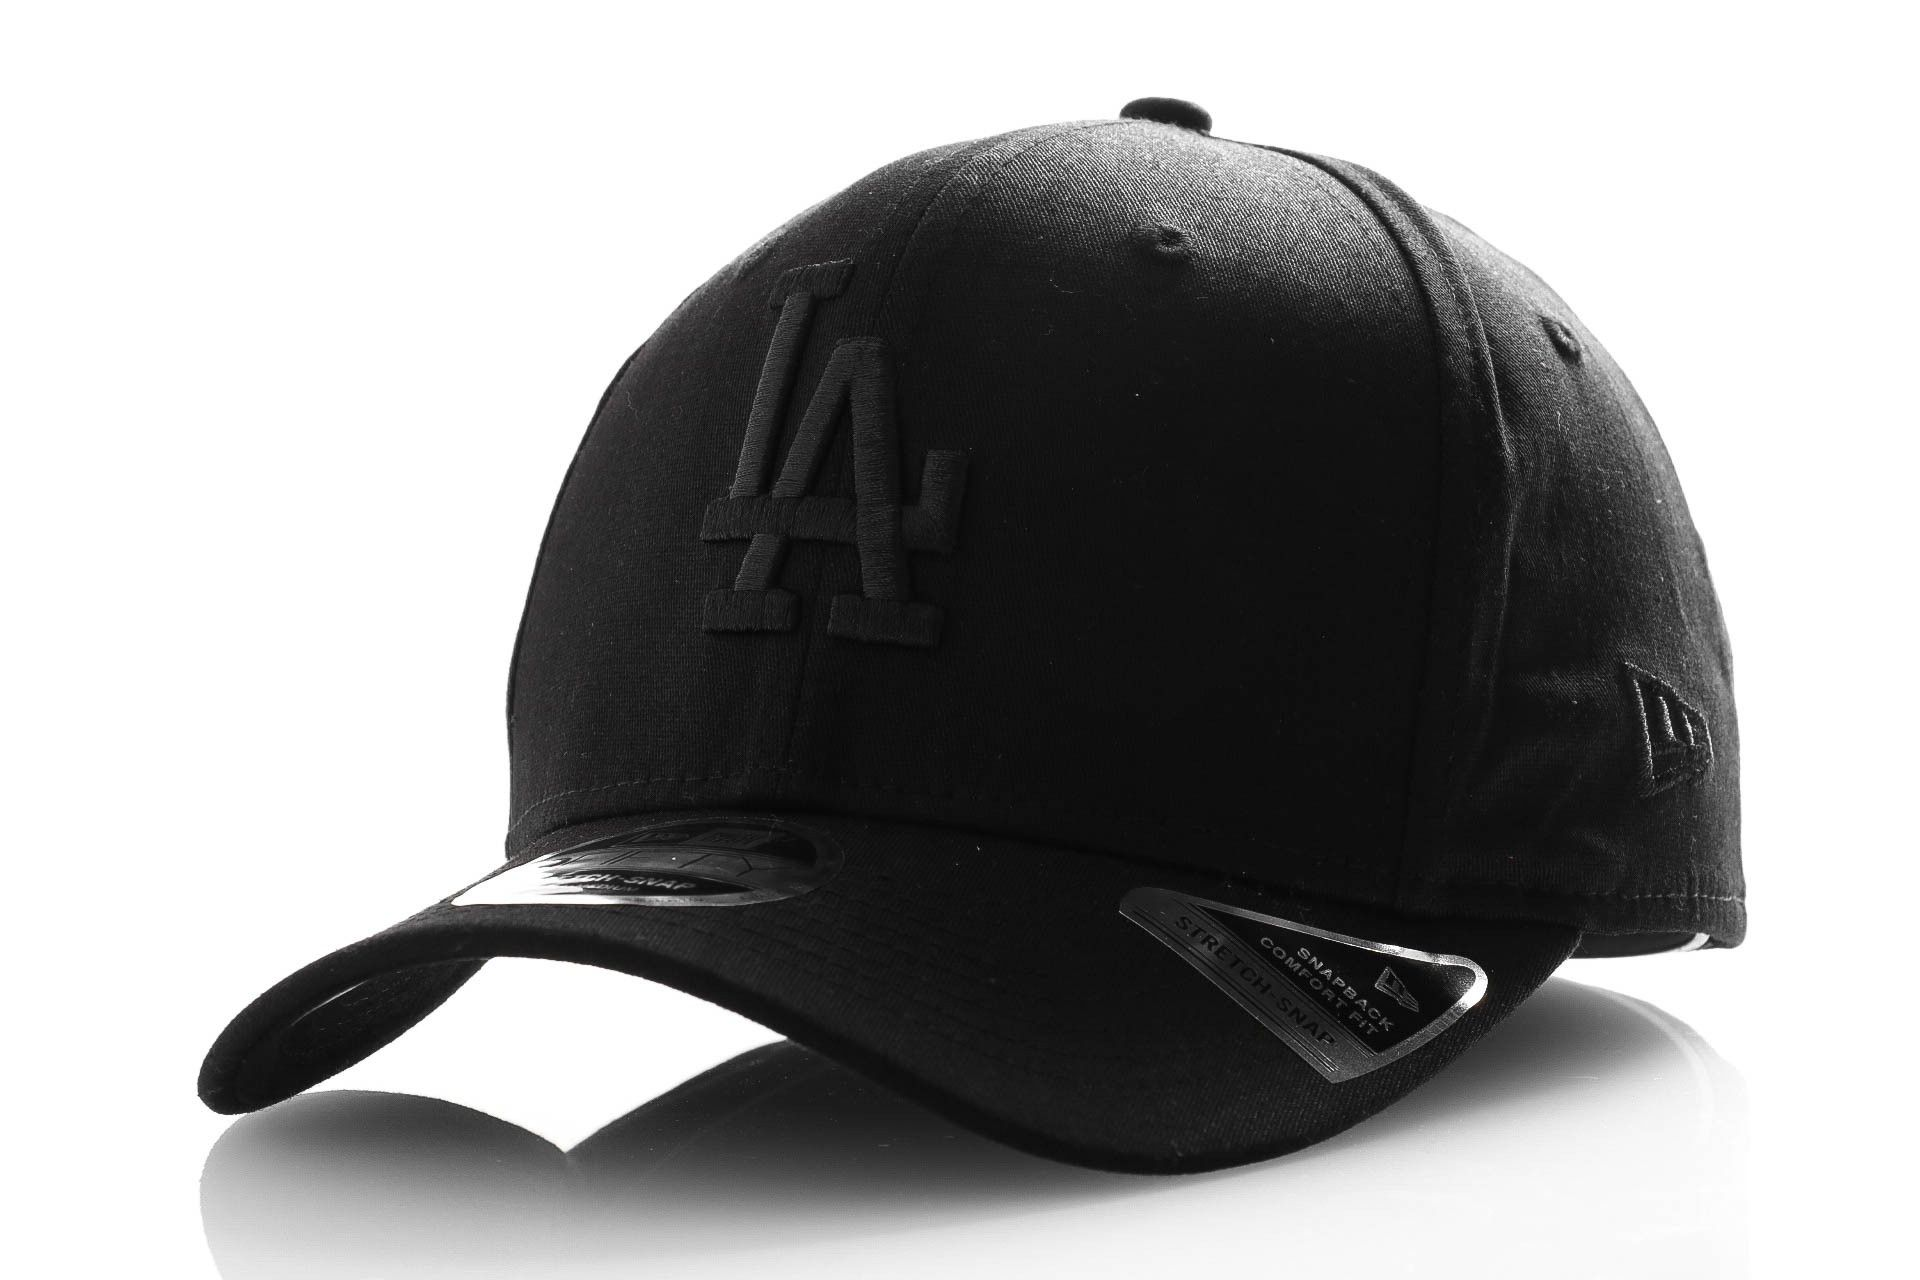 Afbeelding van New Era Snapback Cap Tonal Black 9Fifty Stretch Snap Blk 12285244